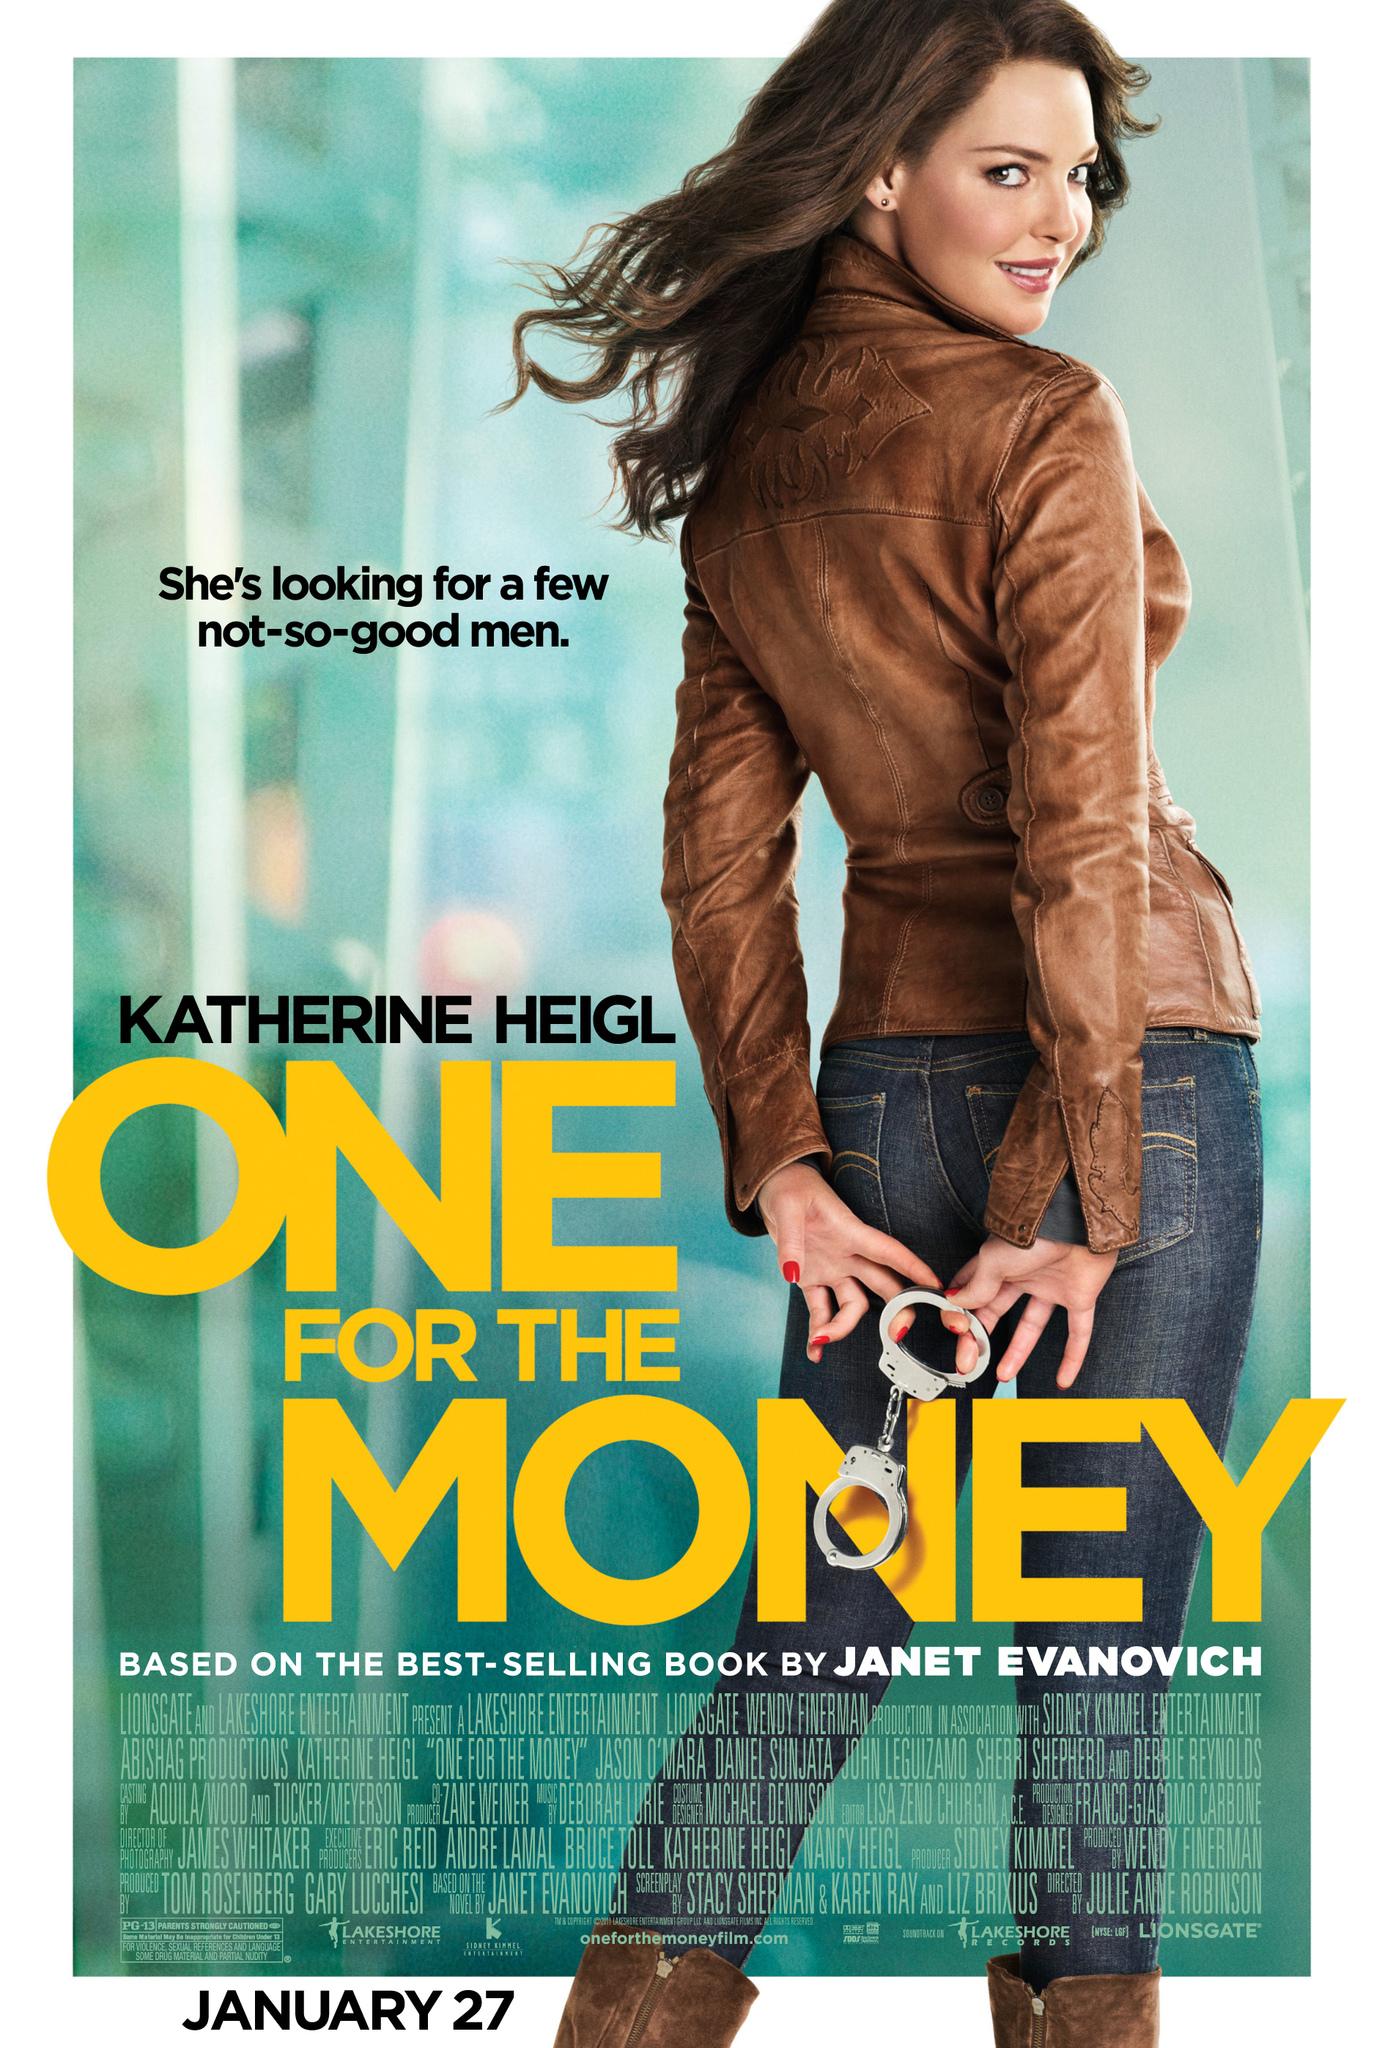 b90504de8 One for the Money (2012) - IMDb